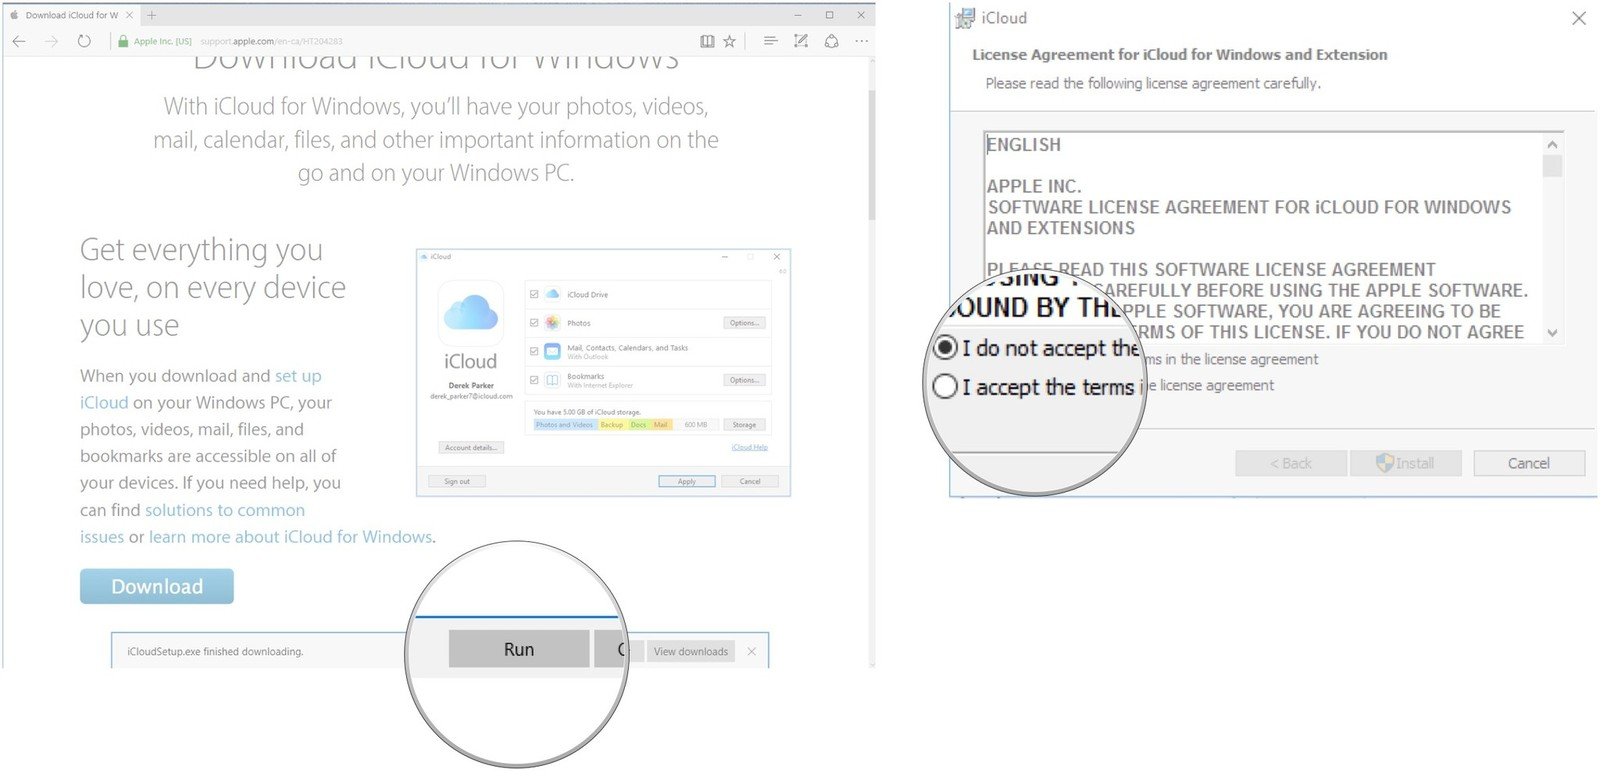 kak-perenesti-fotografii-s-iphone-i-ipad-na-kompyuter-s-windows-10-icloud-2